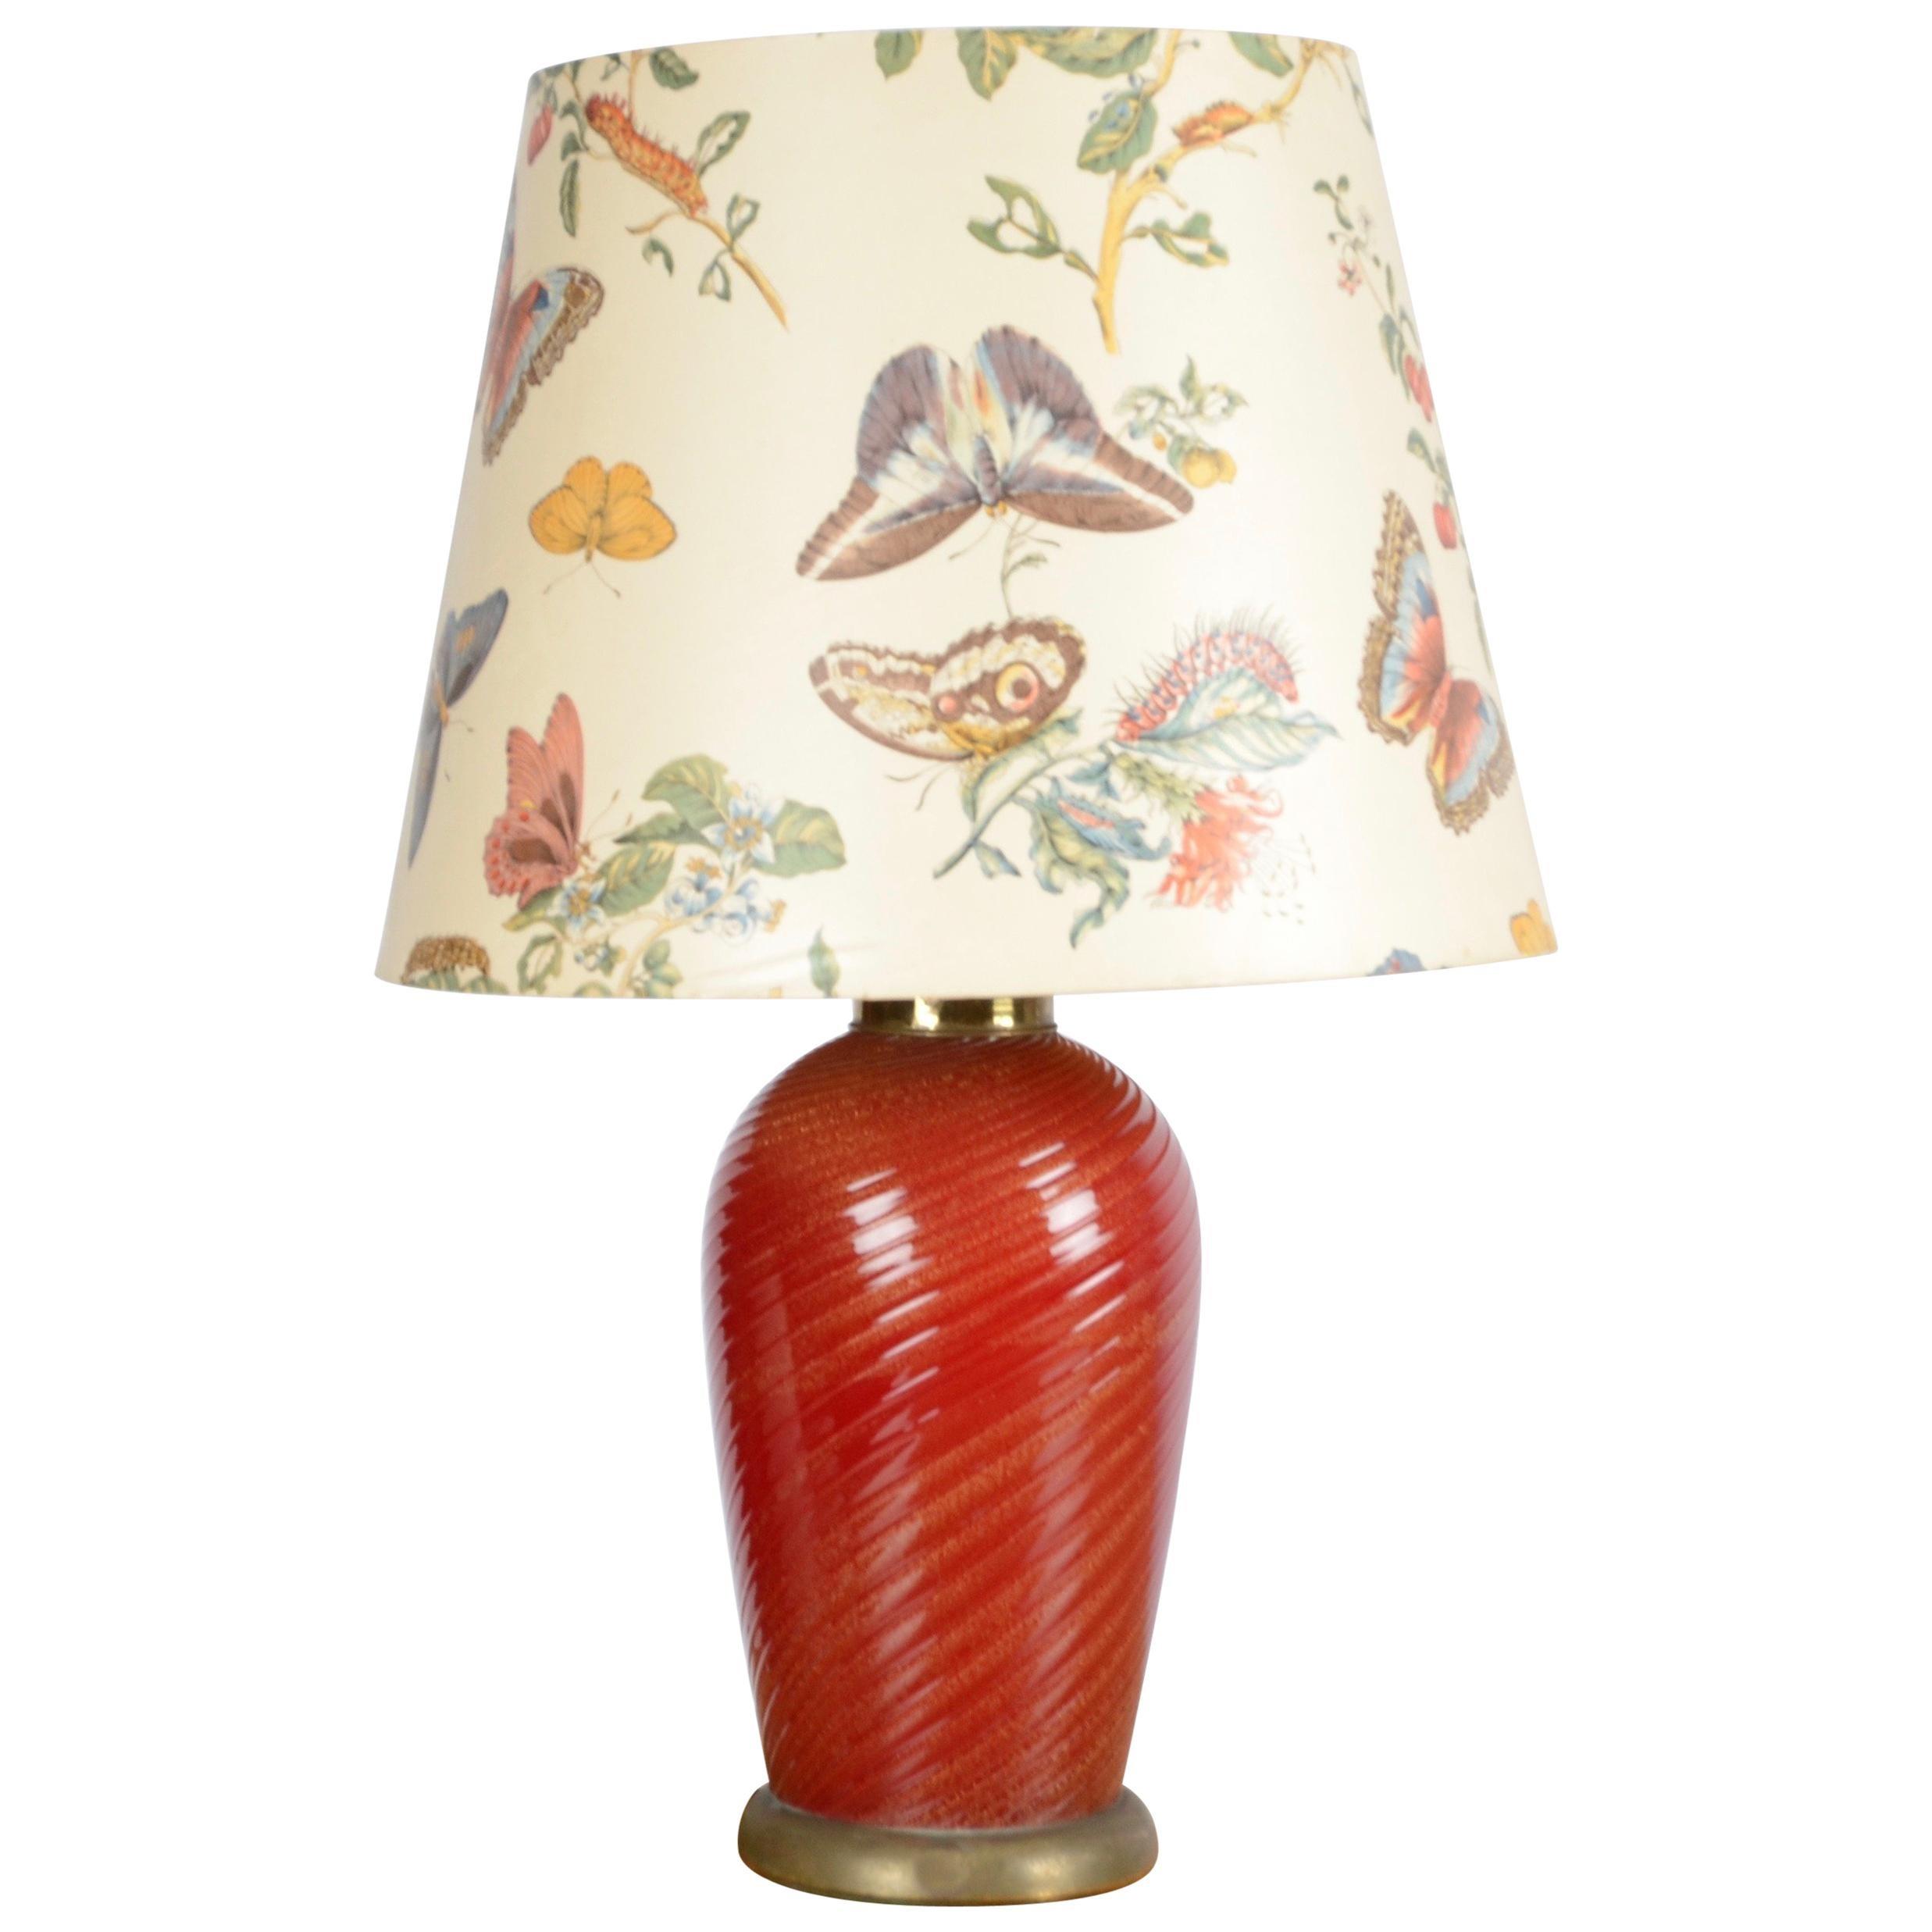 Tommaso Barbi, Table Lamp, 1960s-1970s